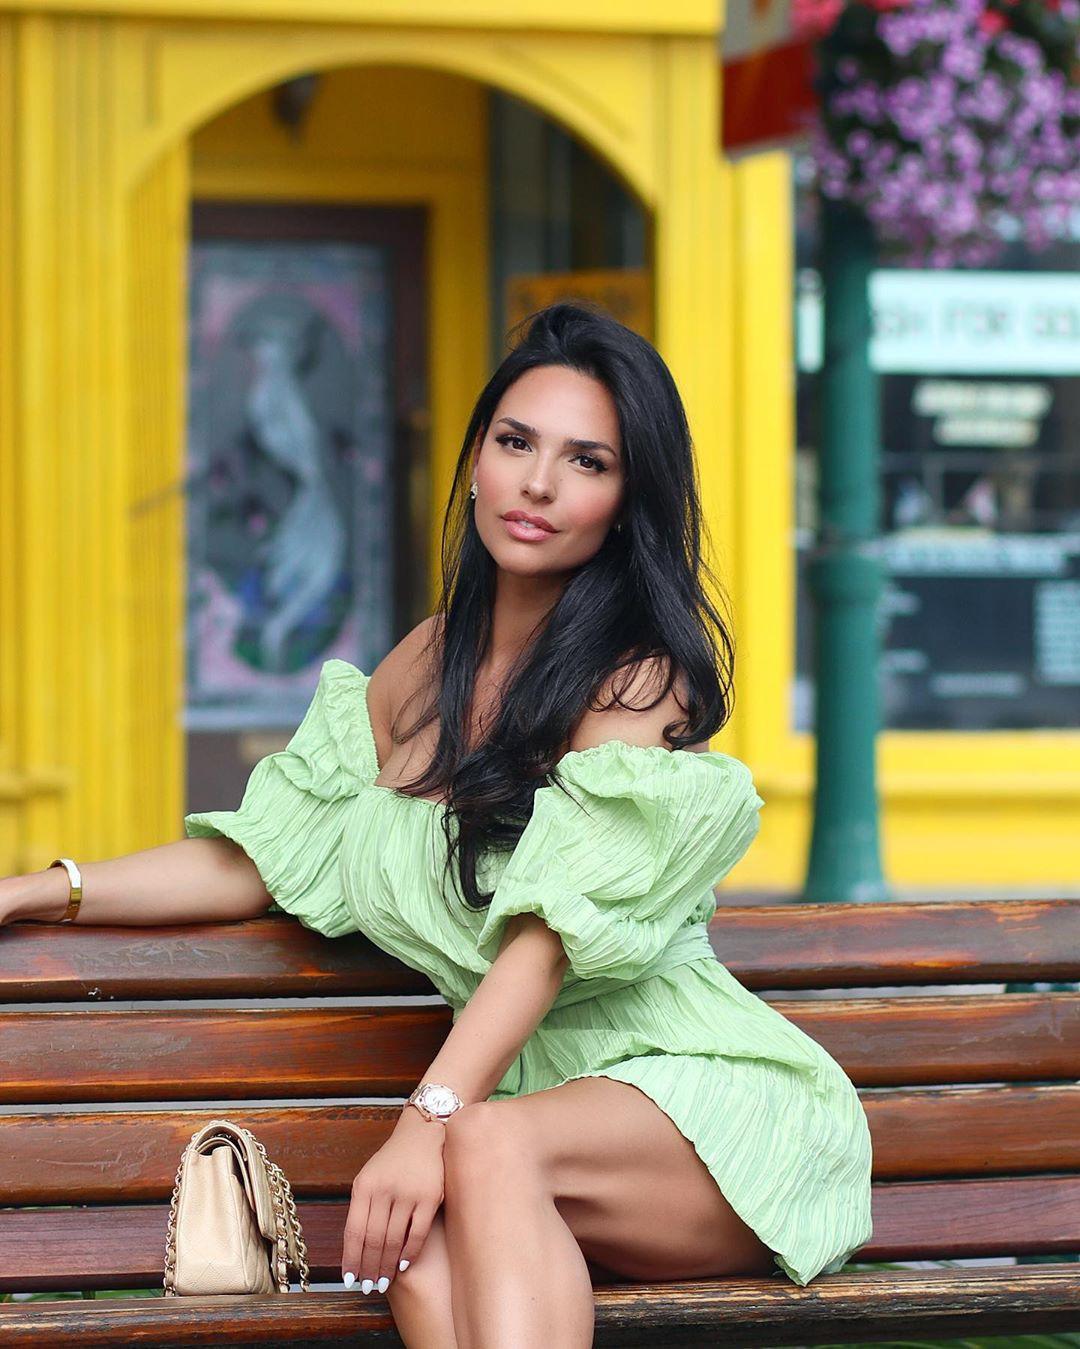 Shadi Y Cair cute girls photos, legs photo, Sexy Models